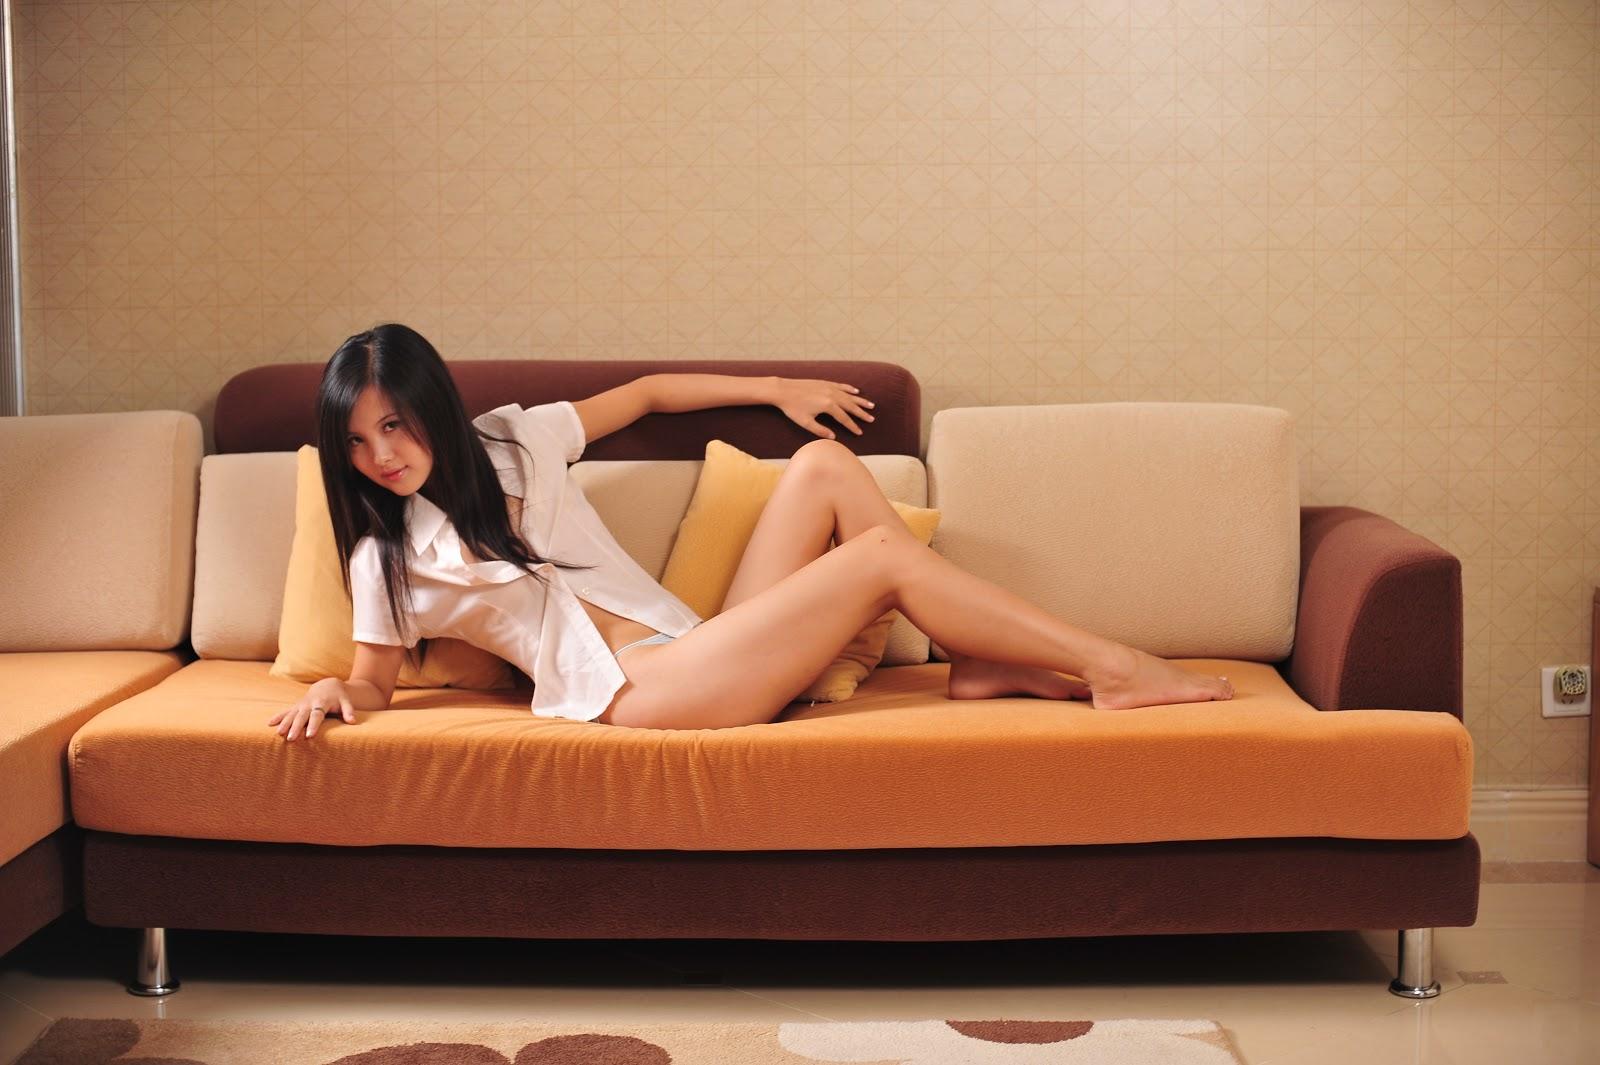 Chinese Nude_Art_Photos_-_204_-_XiangXiang_Vol_4.rar Chinese_Nude_Art_Photos_-_204_-_XiangXiang_Vol_4.rar.DSC_5506